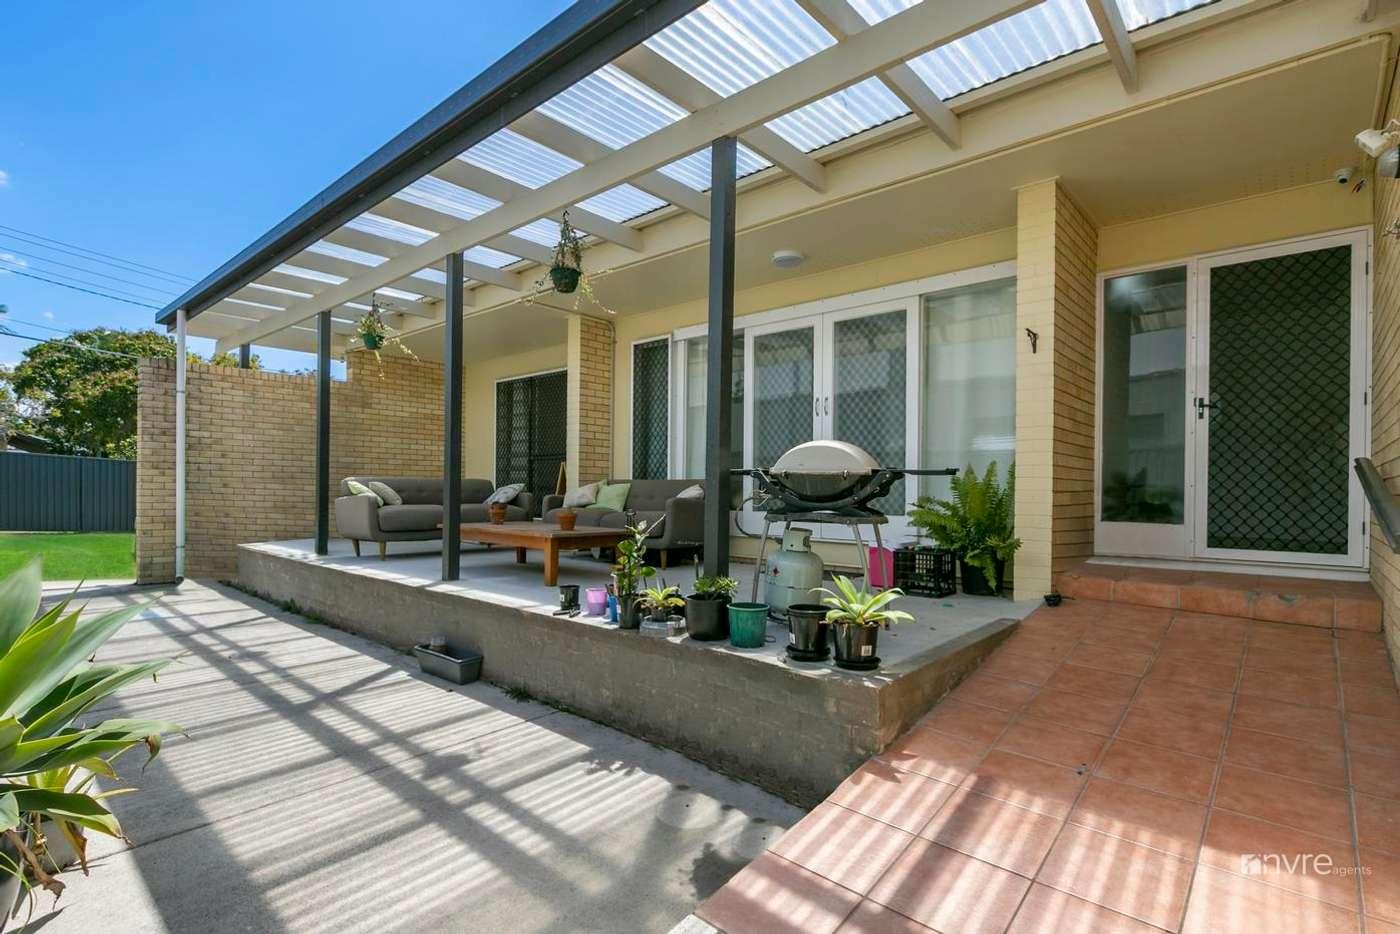 Main view of Homely house listing, 24 Kingsford Street, Kippa-ring QLD 4021